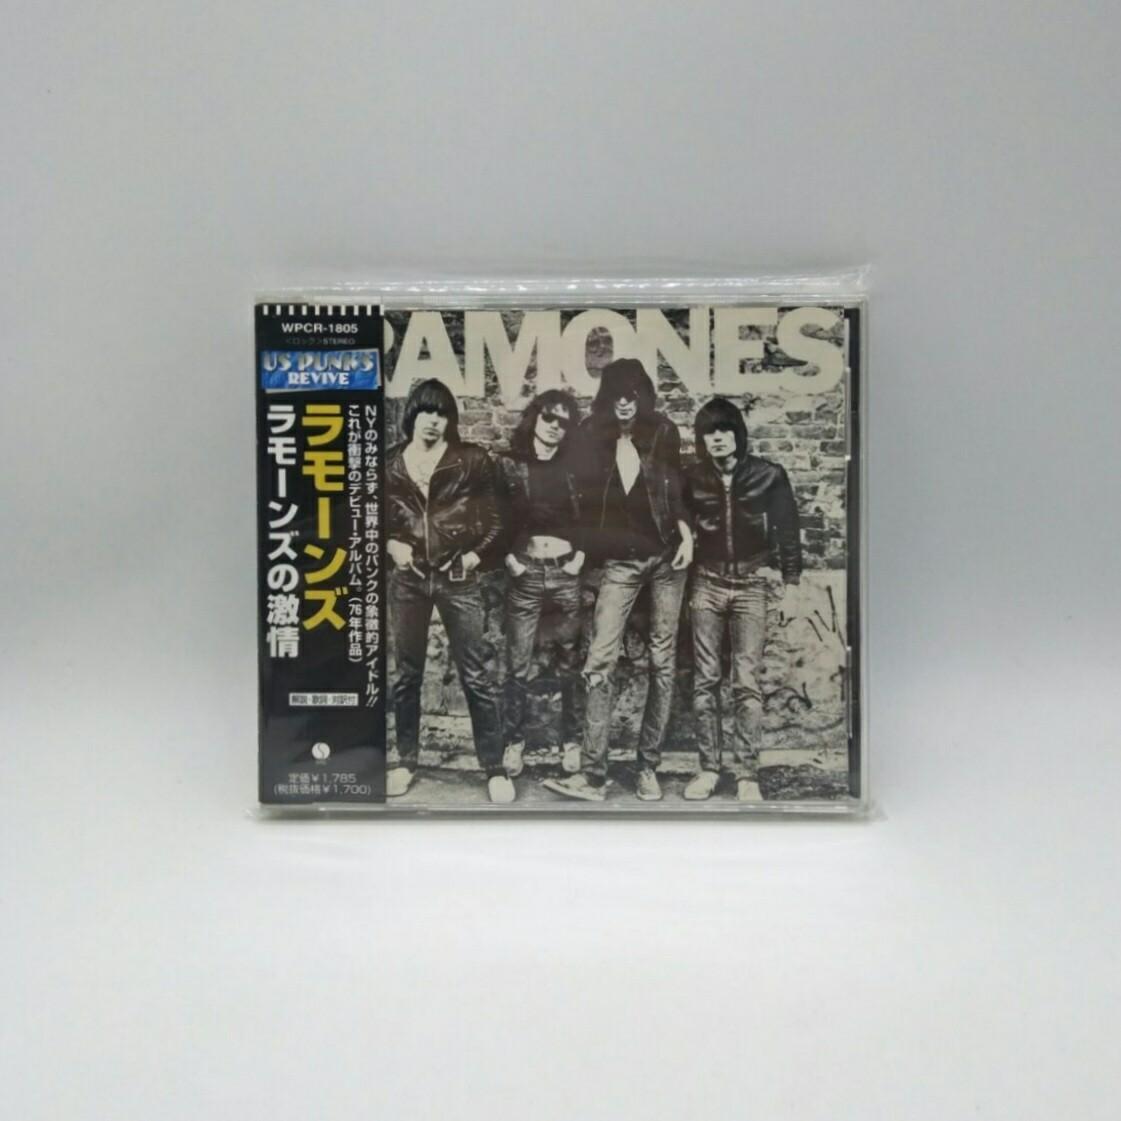 [USED] RAMONES -S/T- CD (JAPAN PRESS)